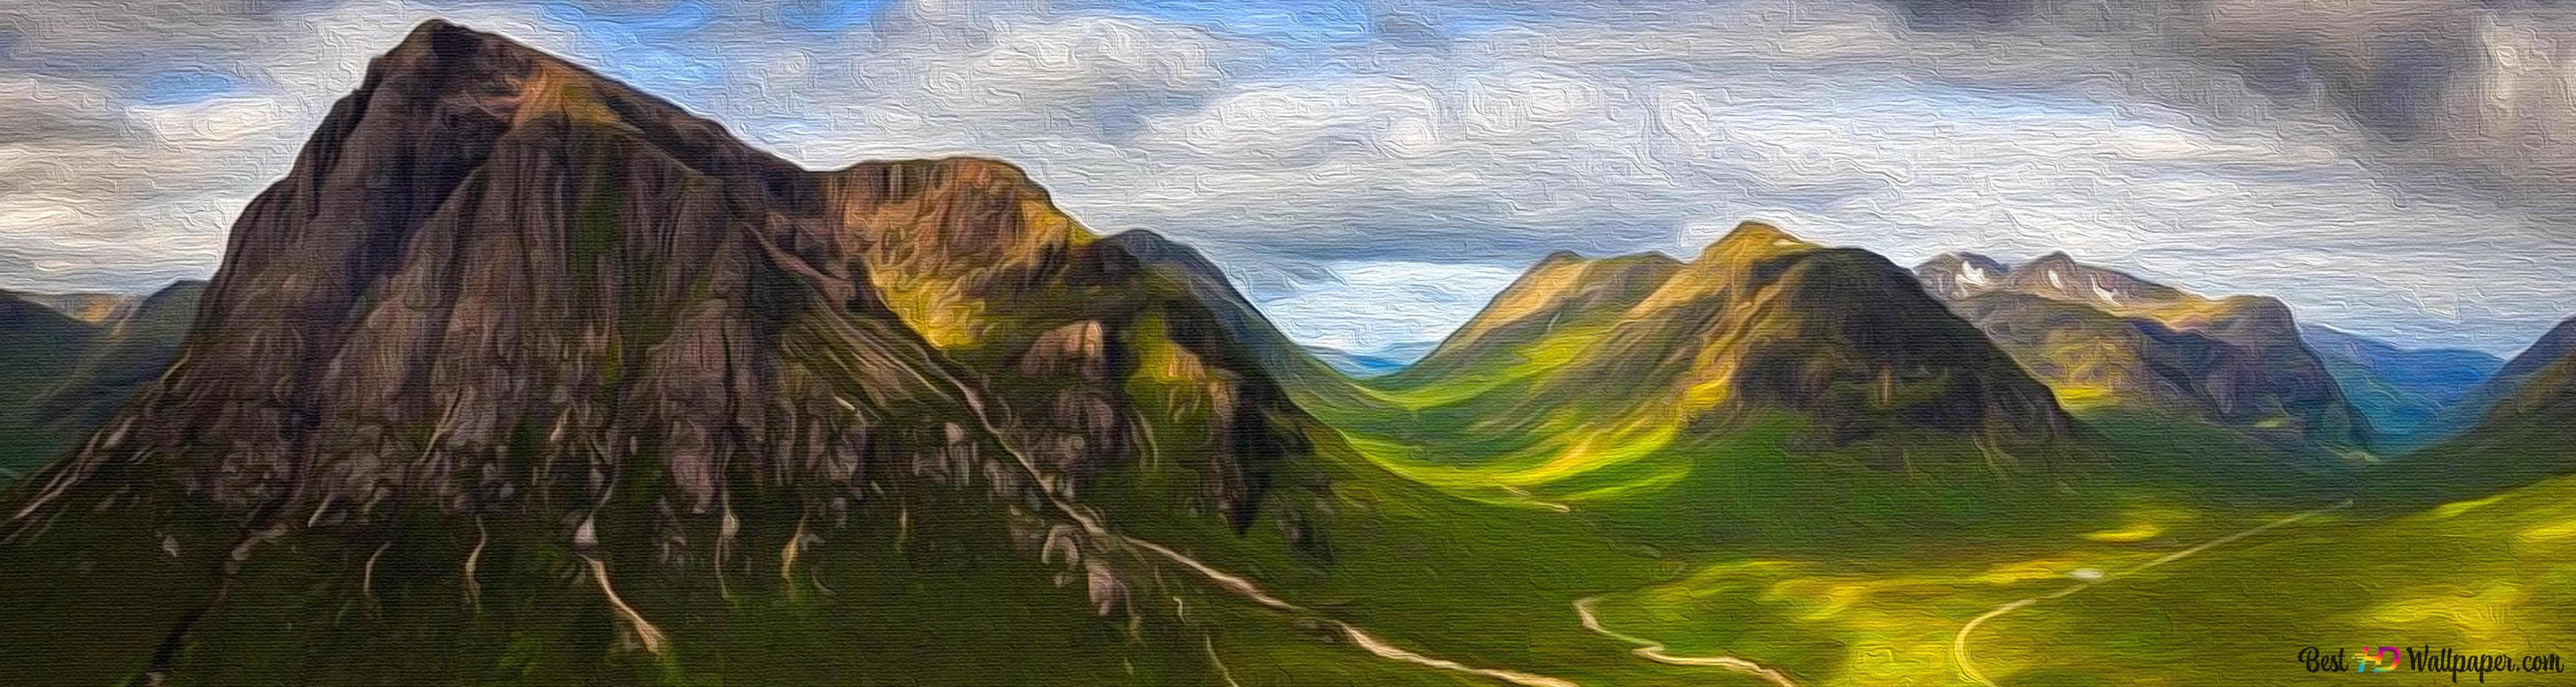 Mountain trail wallpaper download jpg 3840x1024 Wallpaper scotland mountain landscape triple picturesque